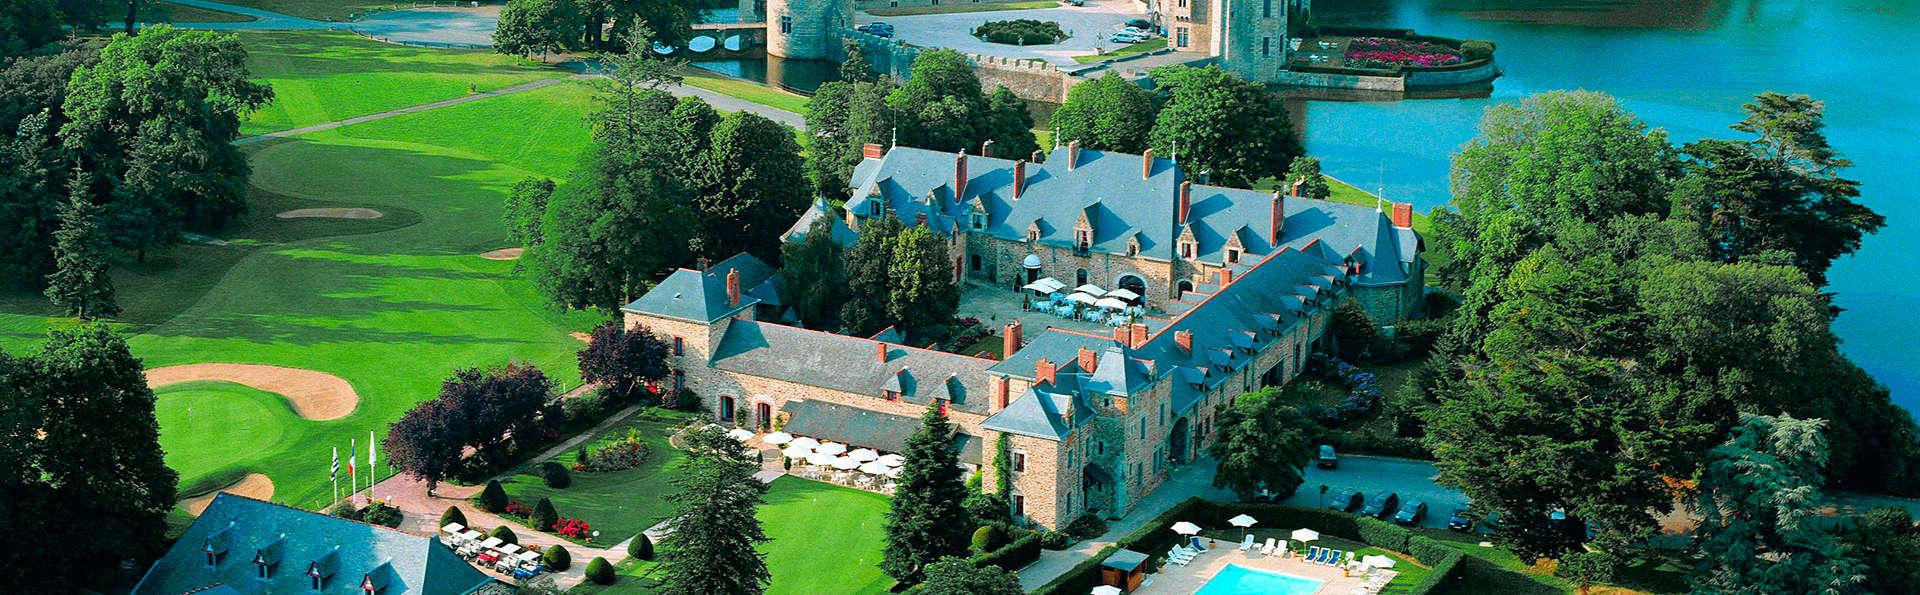 Hôtel Golf & Spa de la Bretesche  - EDIT_frontaerea1.jpg